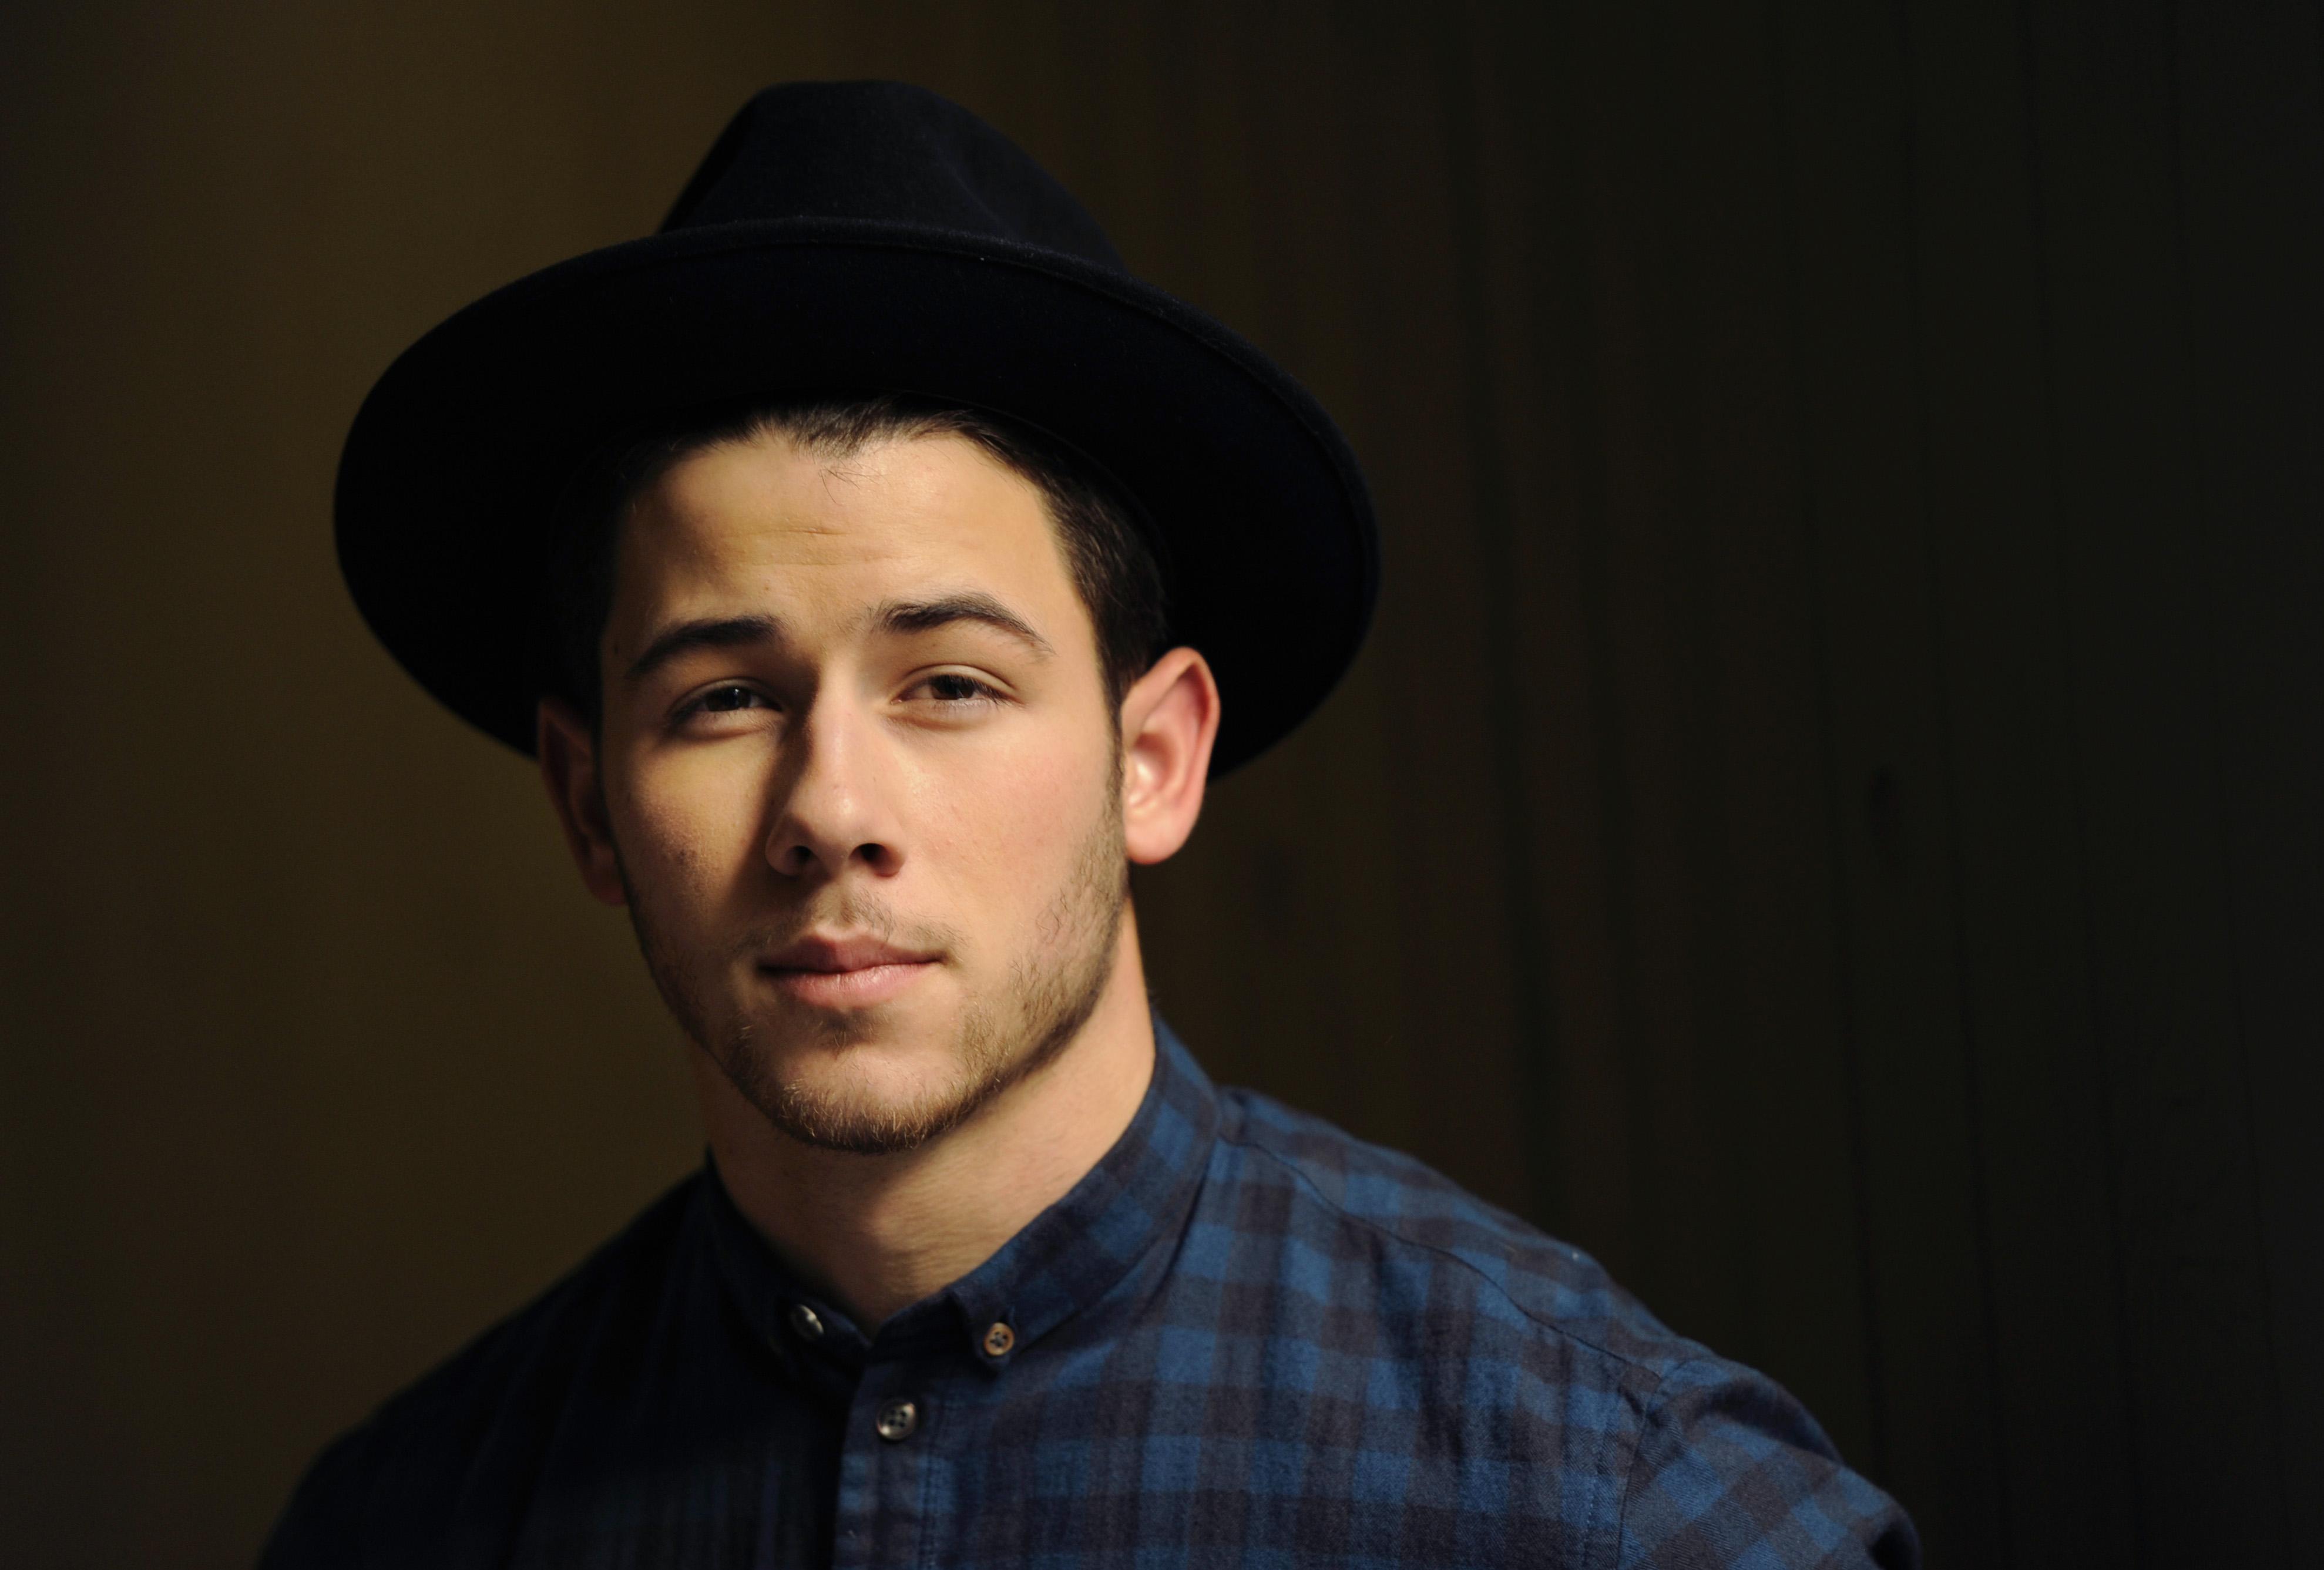 Nick Jonas 4k Ultra HD Wallpaper | Background Image | 3956x2673 | ID:692343 - Wallpaper Abyss